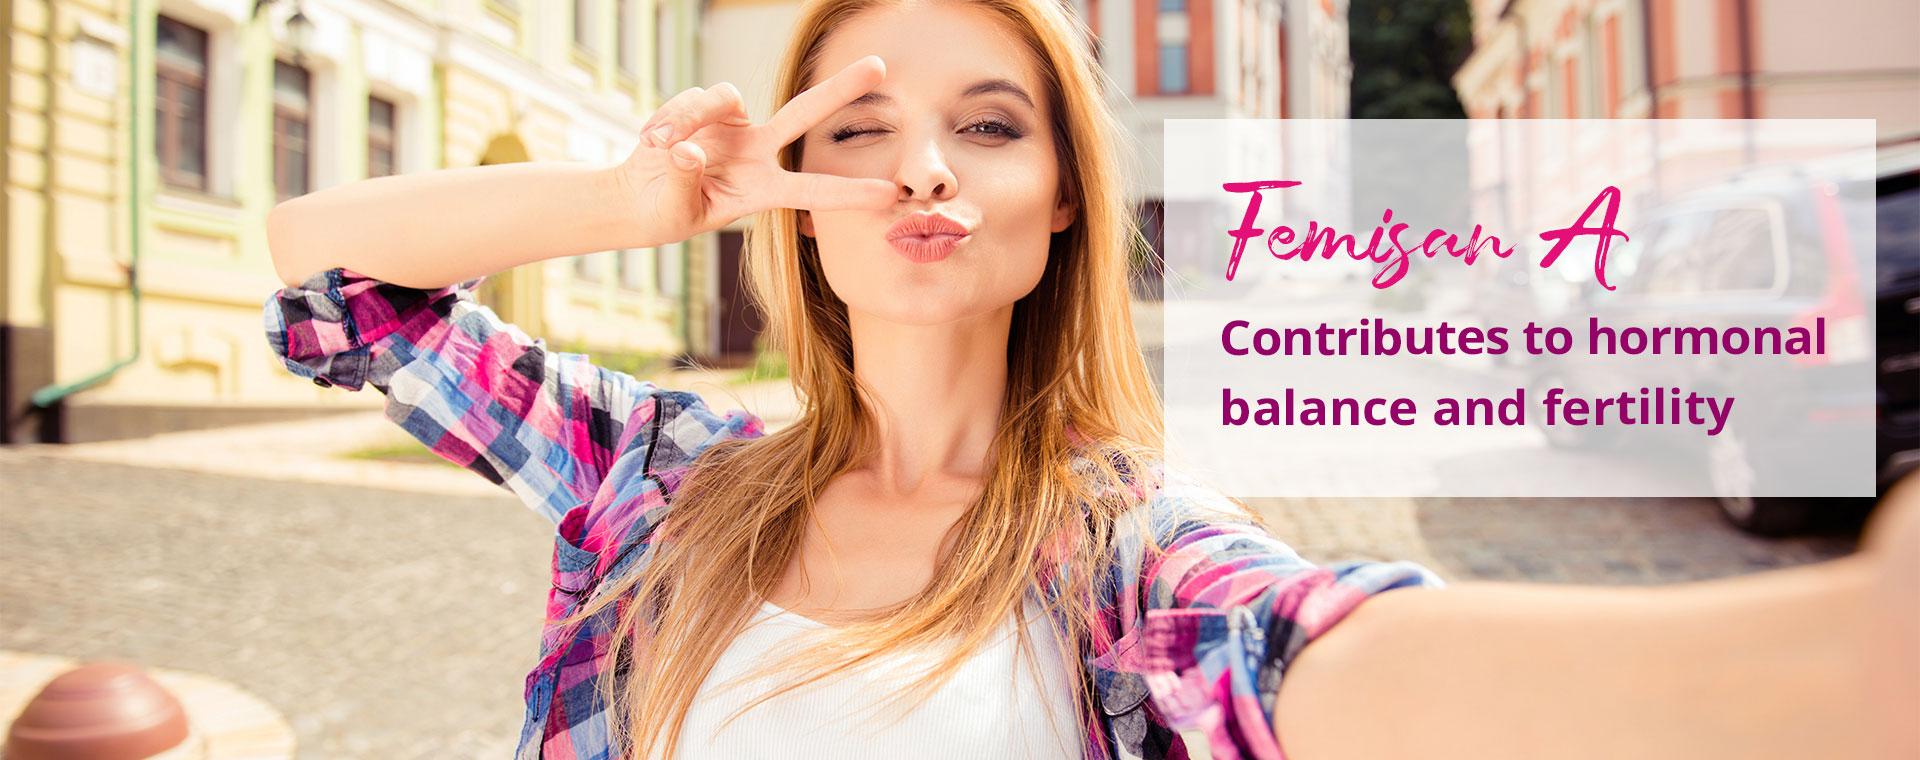 femisan a herb drops for hormonal balance